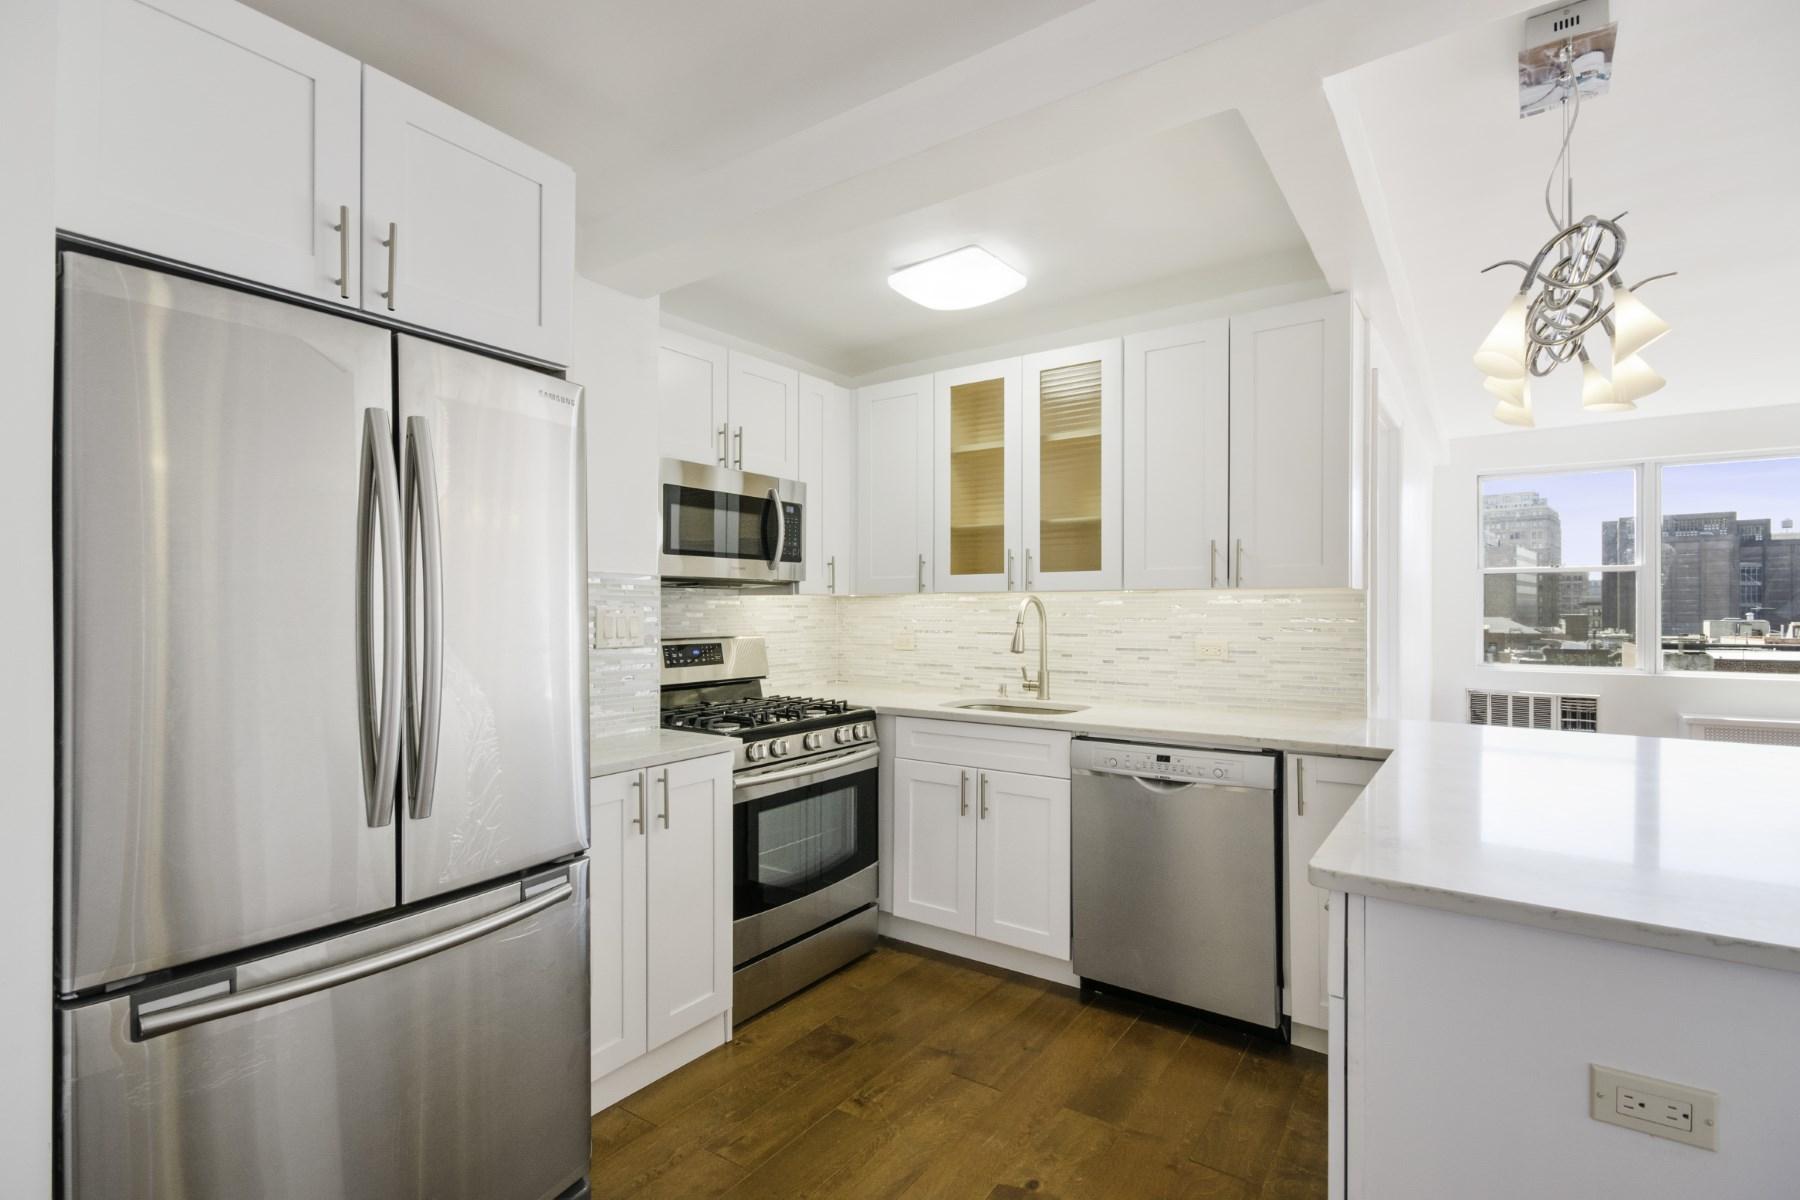 Condominium for Sale at 50 Bayard Street, Apt. 8E 50 Bayard Street Apt 8E Chinatown, New York, New York, 10013 United States